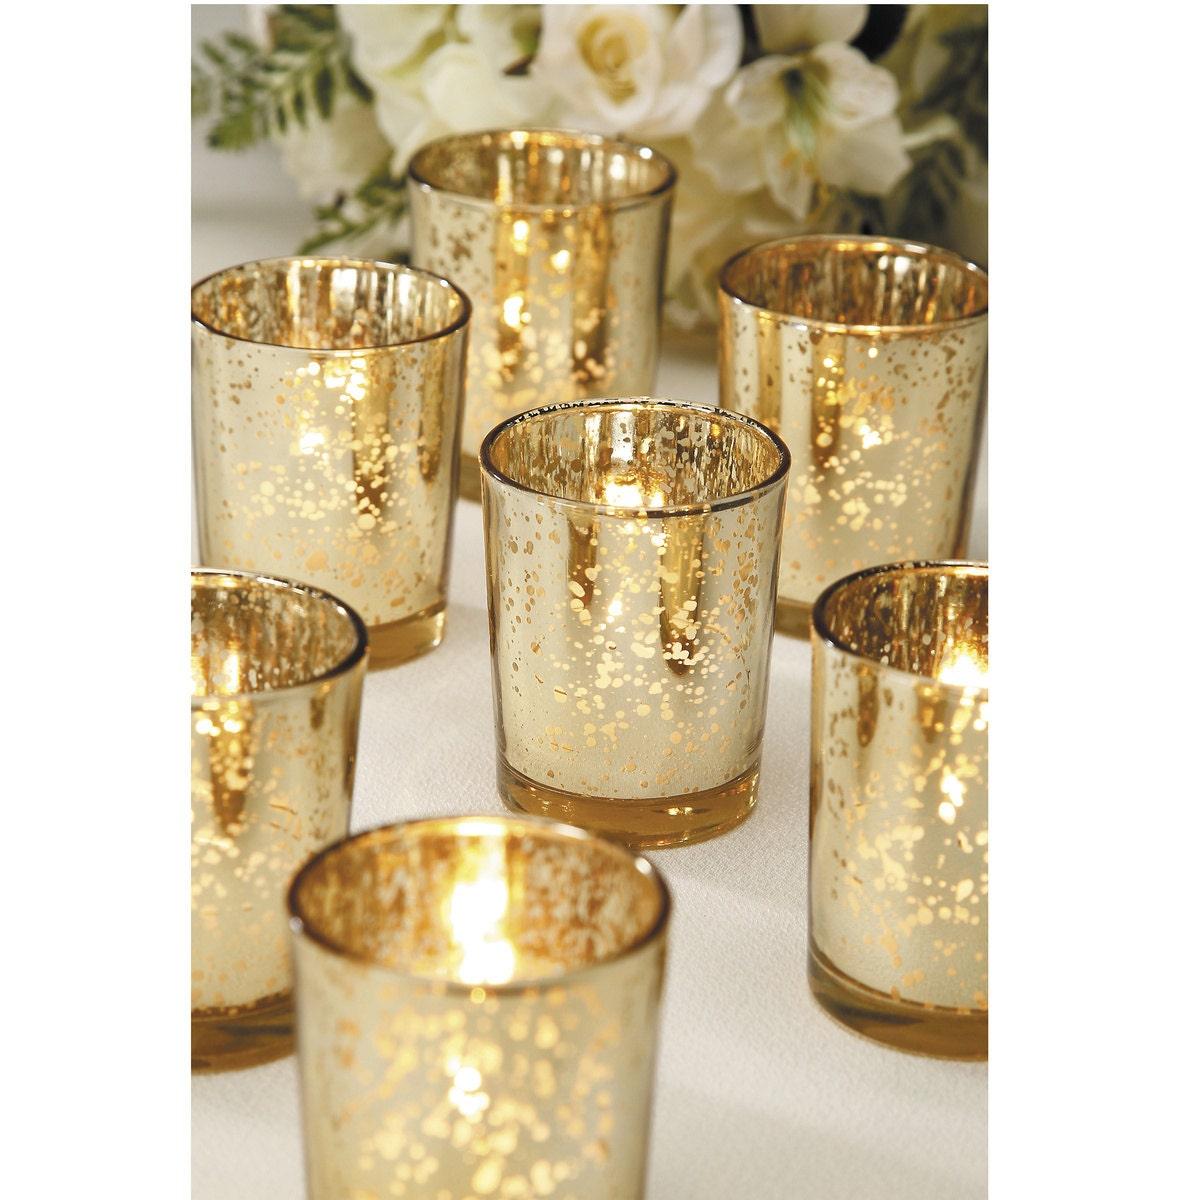 sale 60 gold mercury glass votive candle holders bulk lot. Black Bedroom Furniture Sets. Home Design Ideas